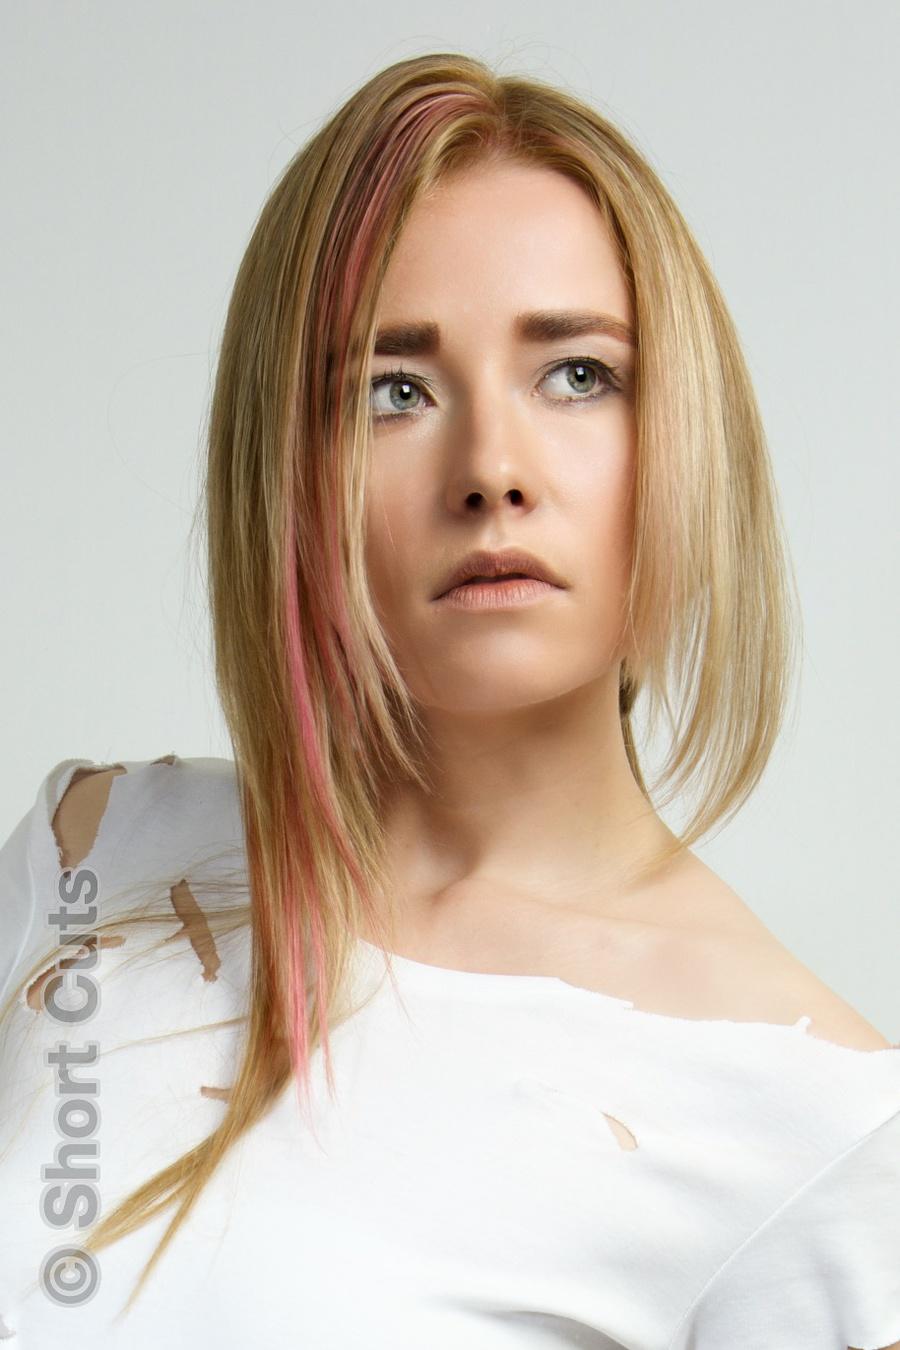 Masha / Photography by Stephen Norris, Model Masha123, Hair styling by Chris Evans / Uploaded 22nd February 2015 @ 12:03 PM